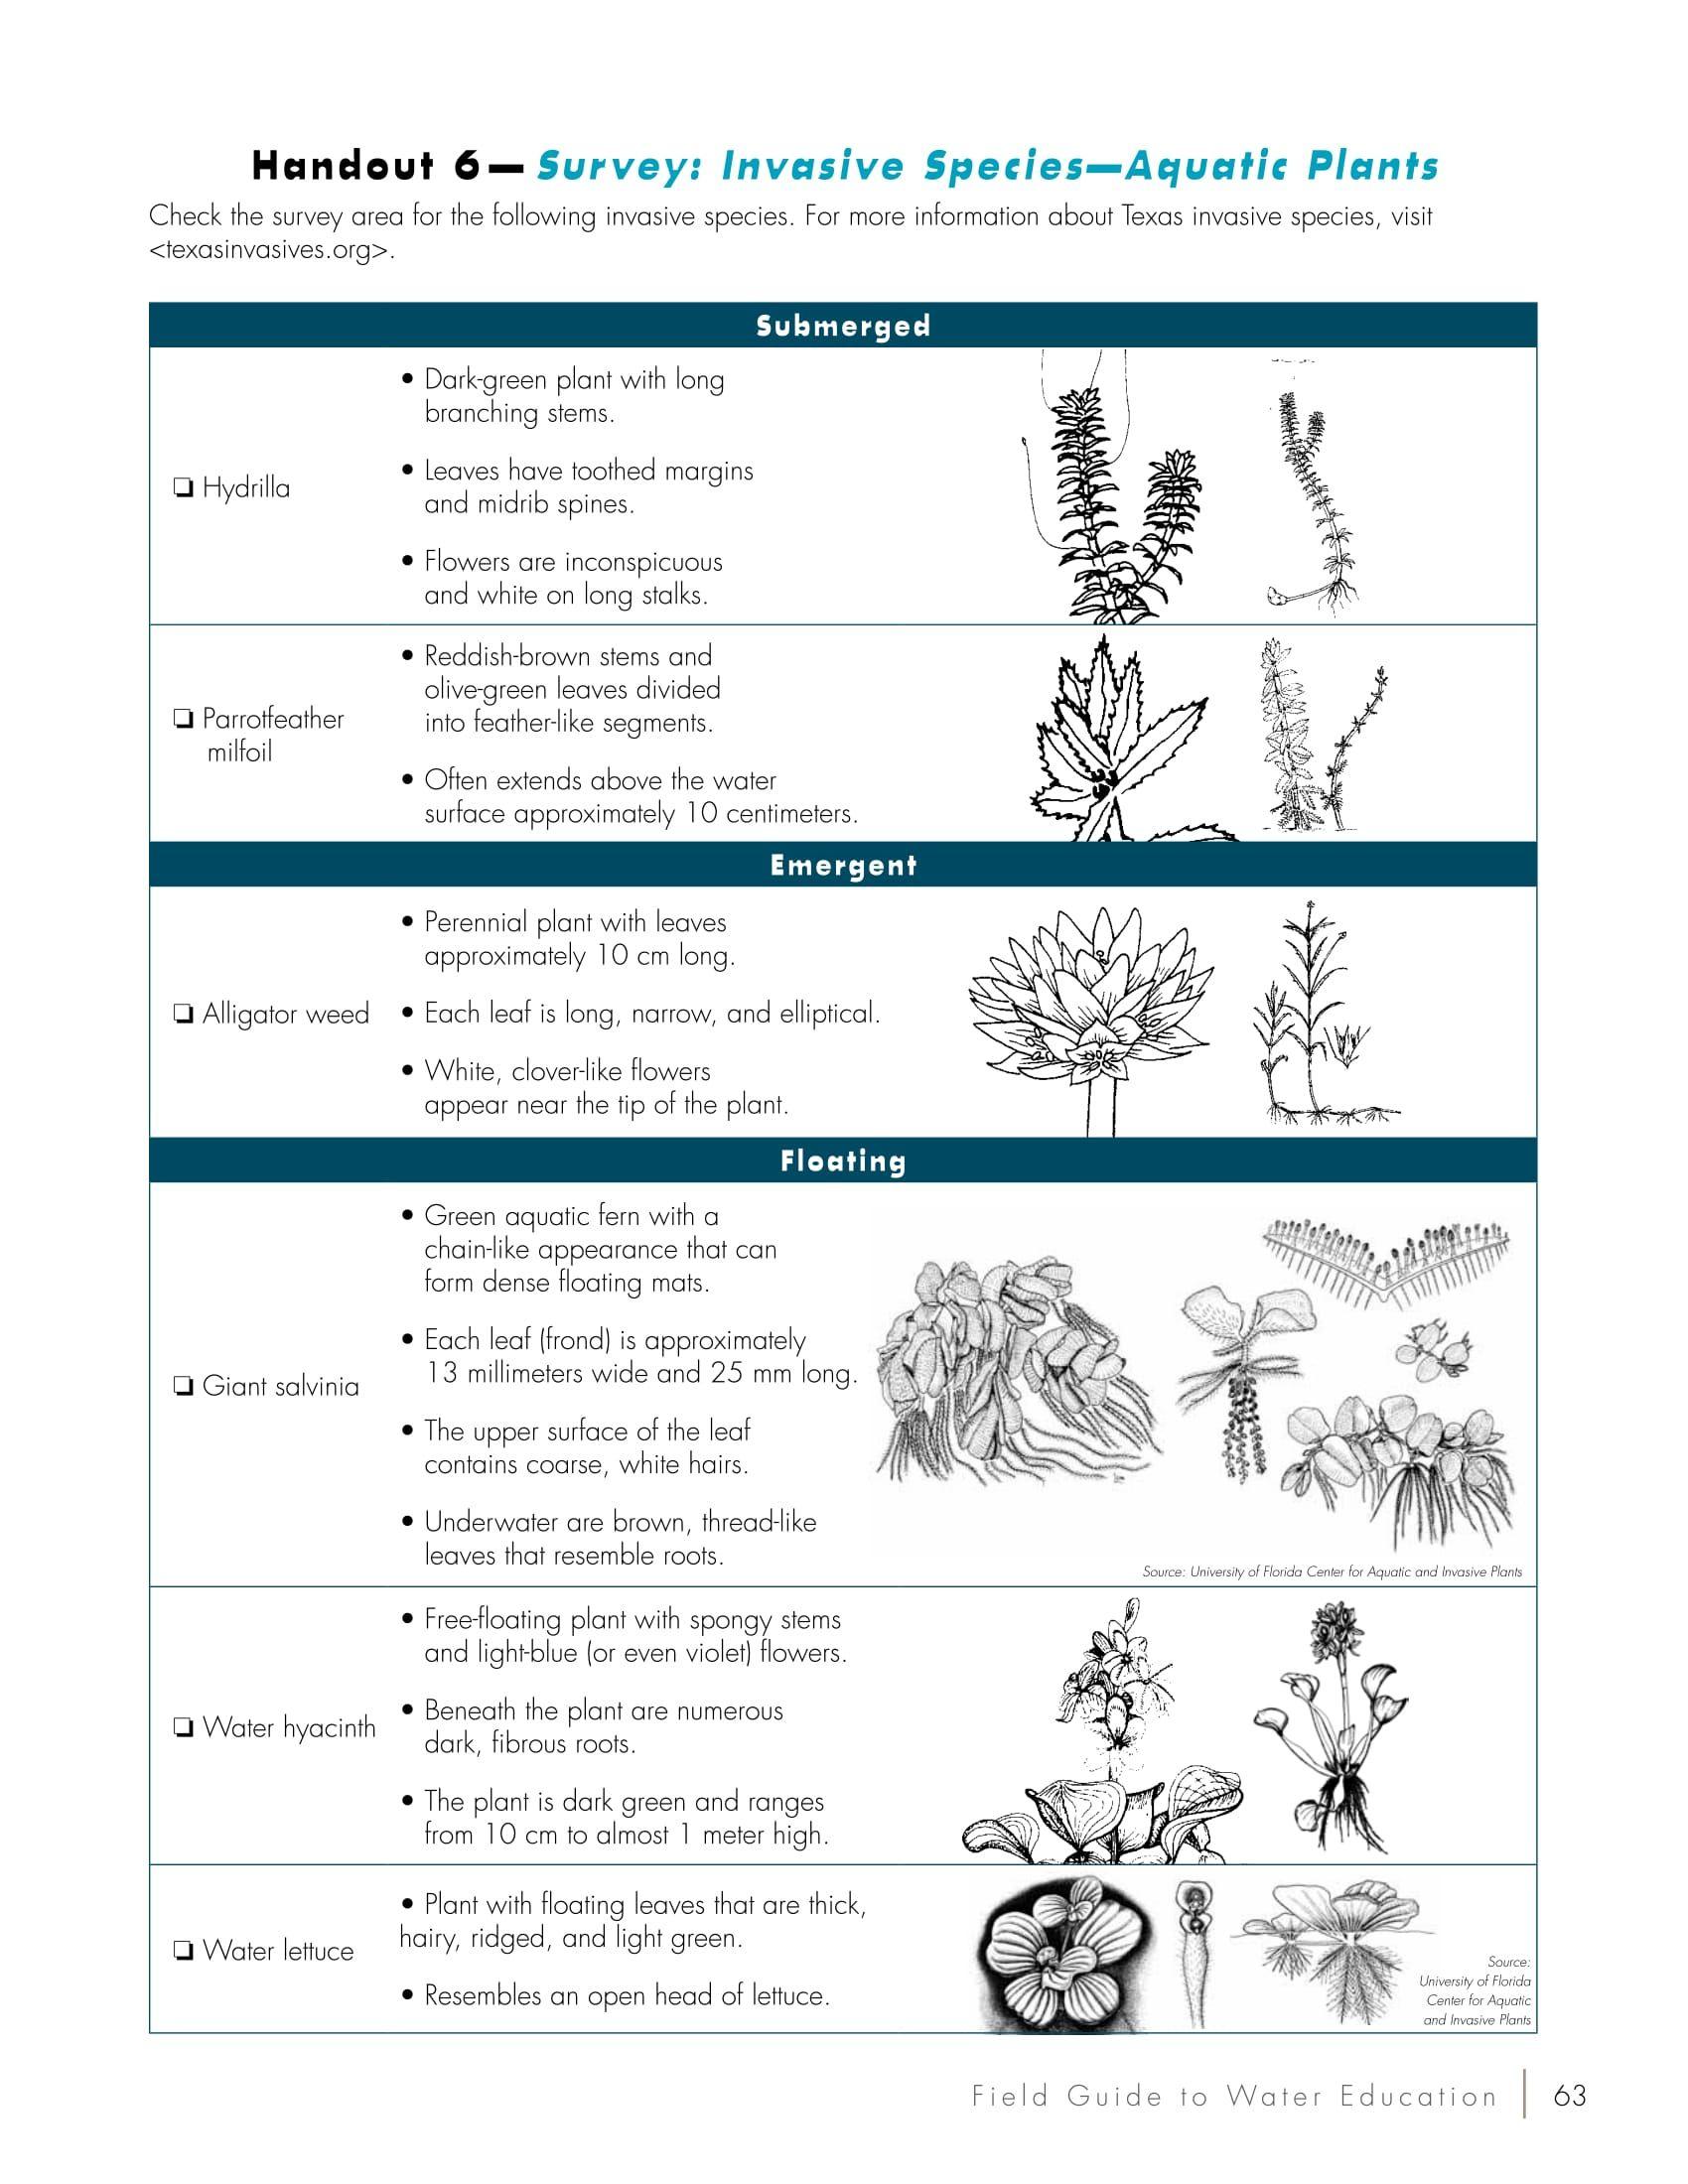 Survey: Invasive Species - Aquatic Plants Student Handout